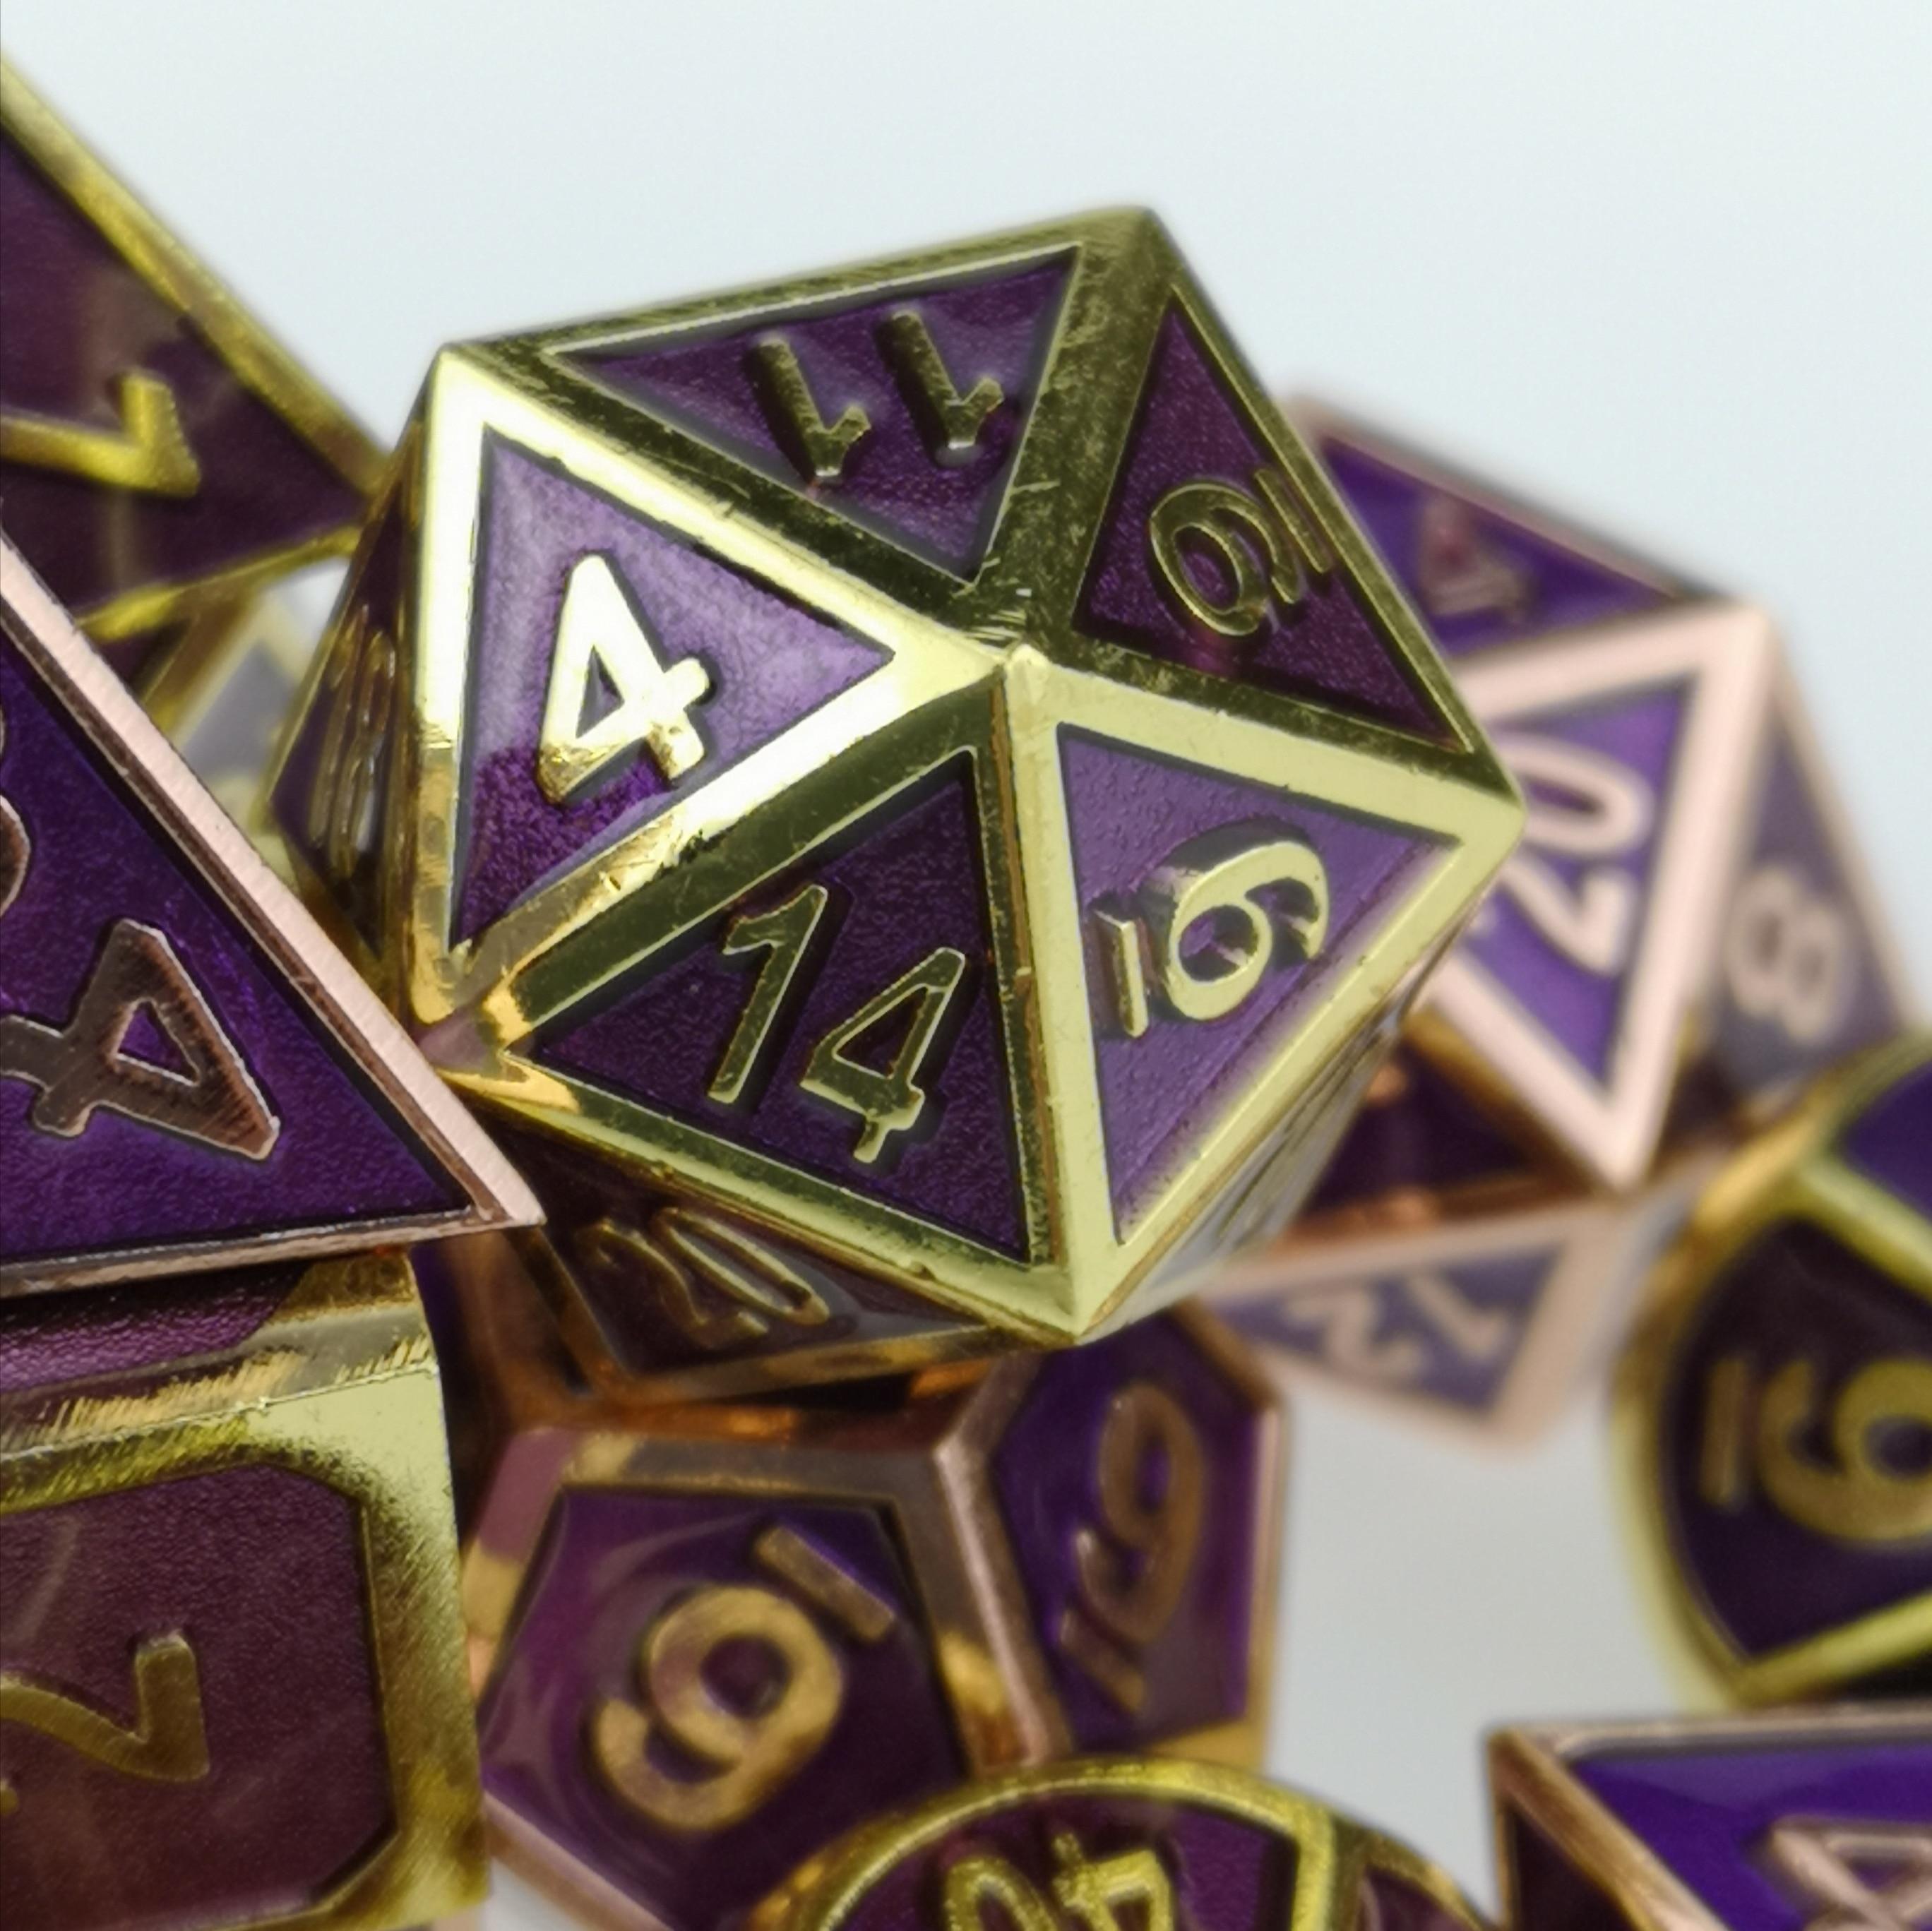 Standard 7-Die Set Purple Metal Dice Copper / Brass